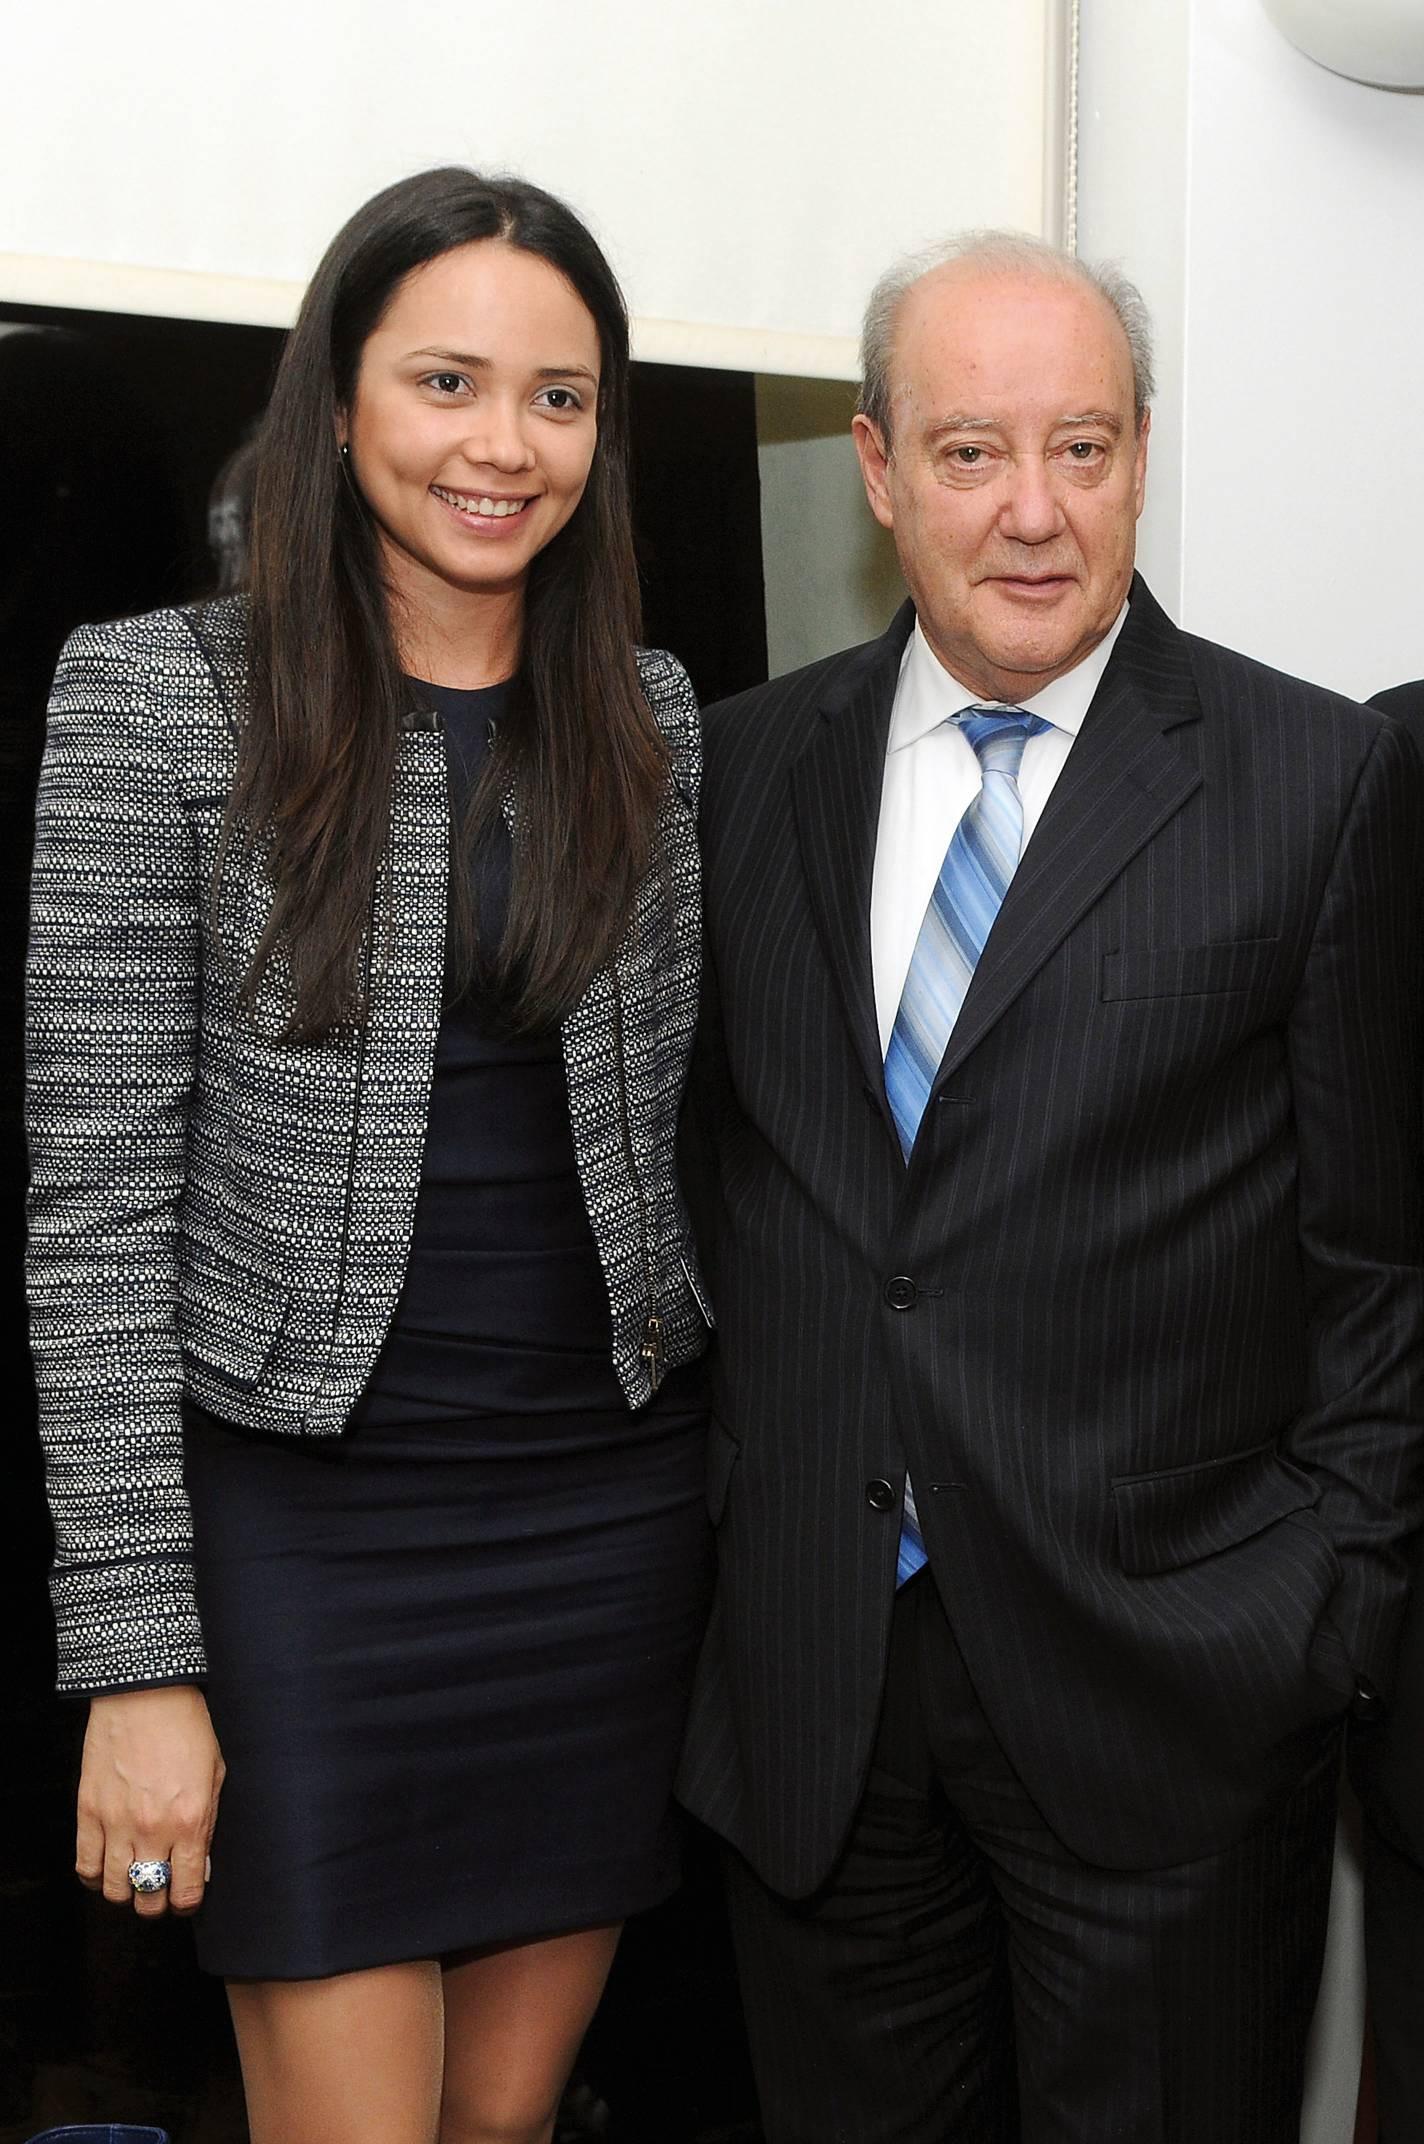 Fernanda Miranda e Pinto da Costa.jpg